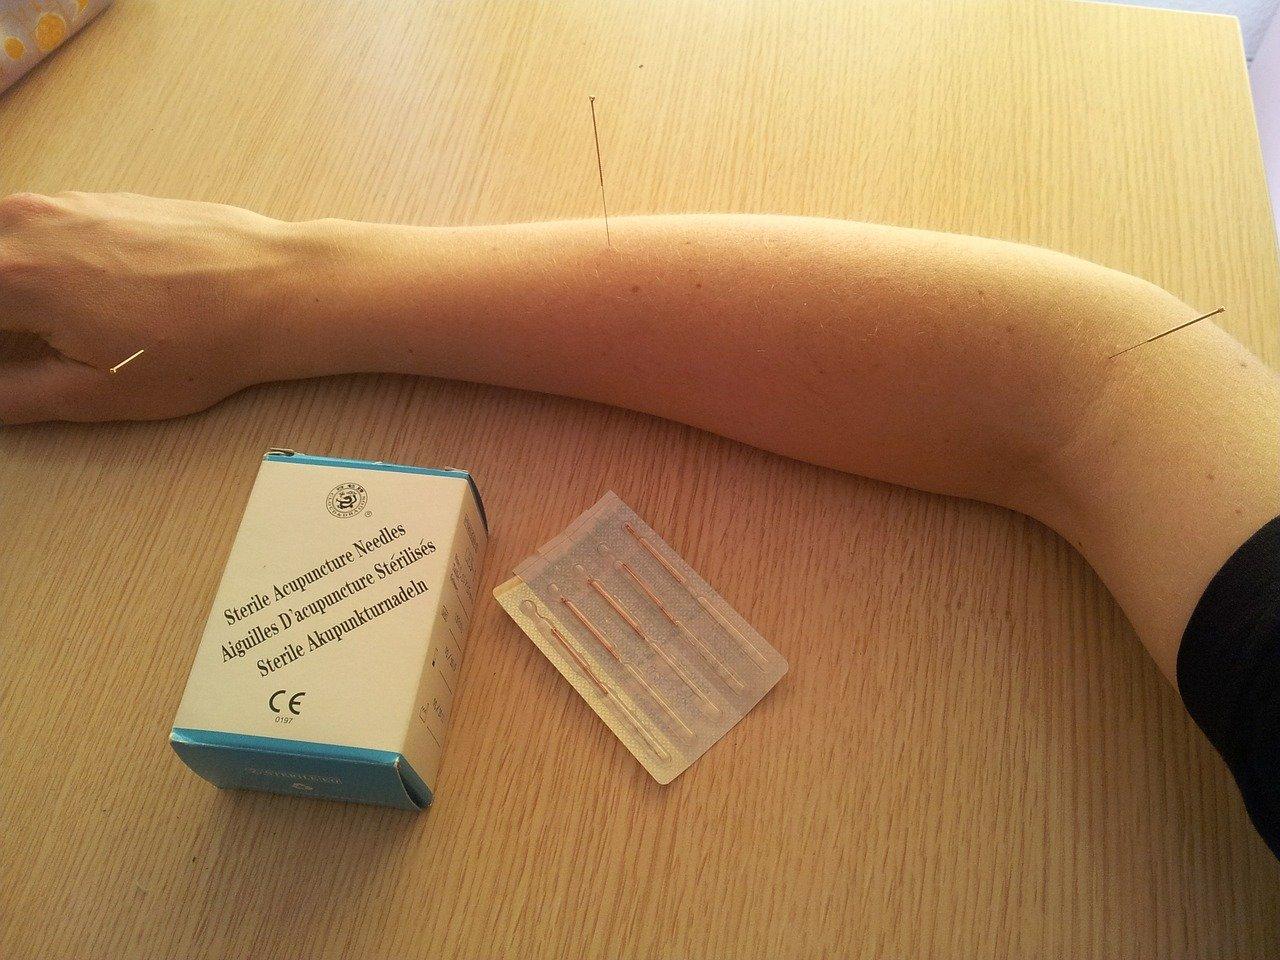 Helios fysiotherapie en revalidatie dry needling